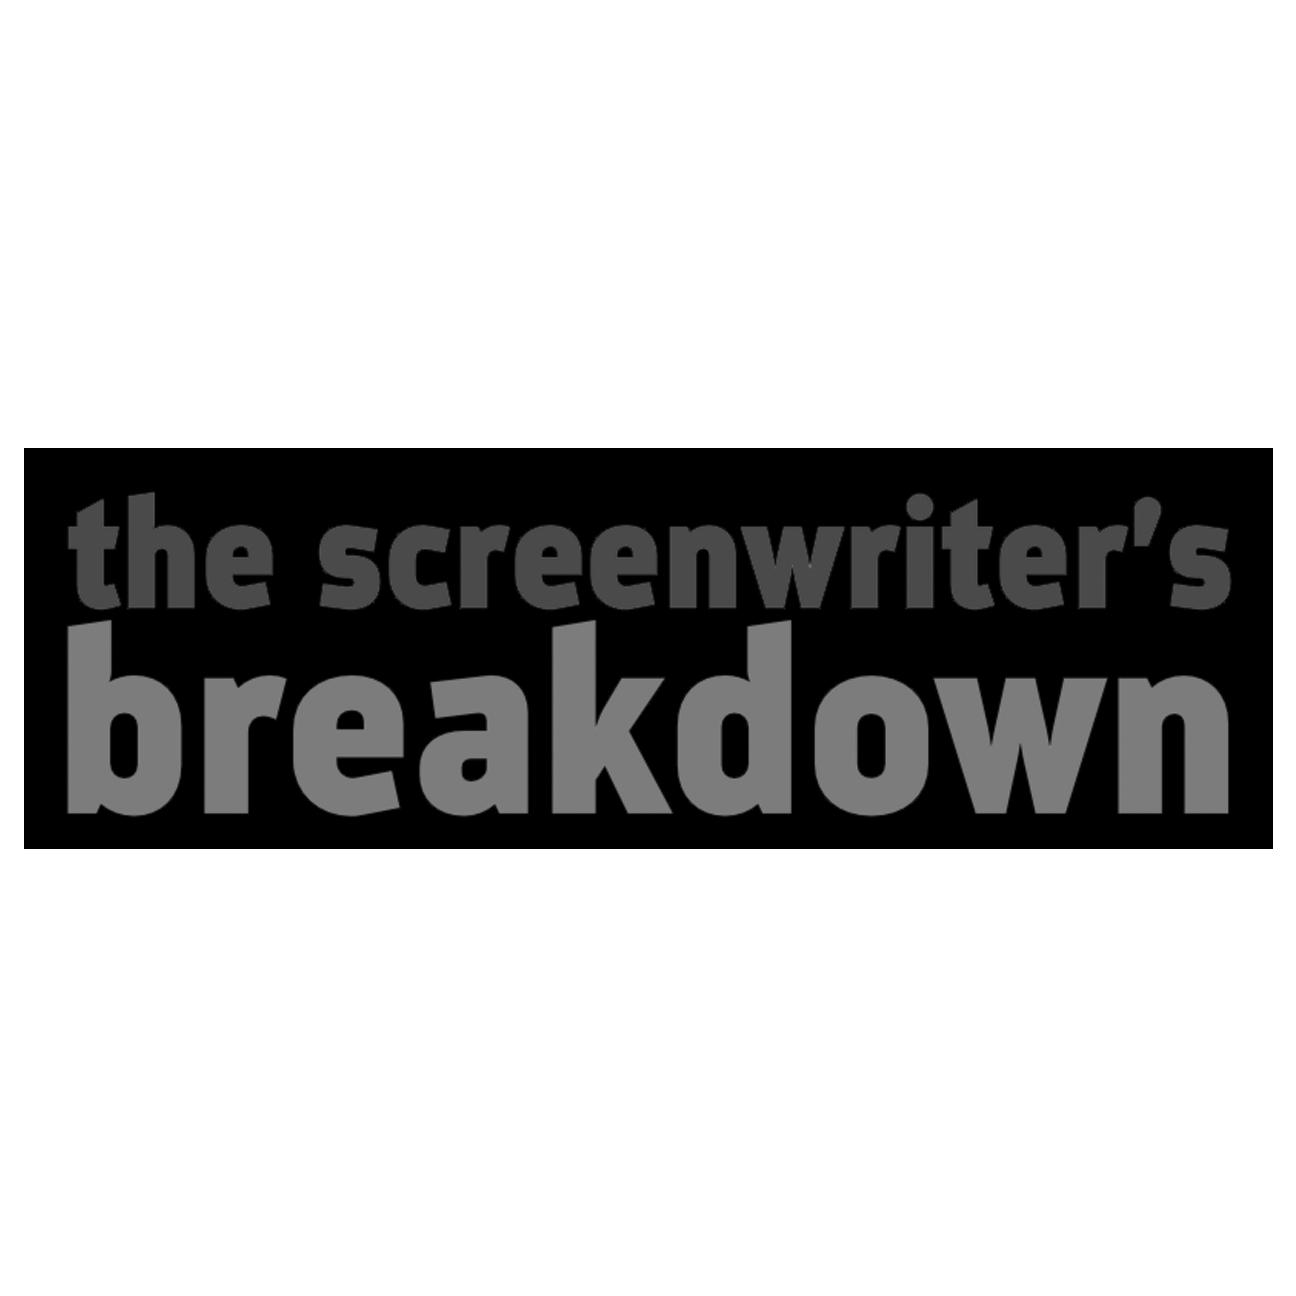 ScreenwritersBreakdown.jpg